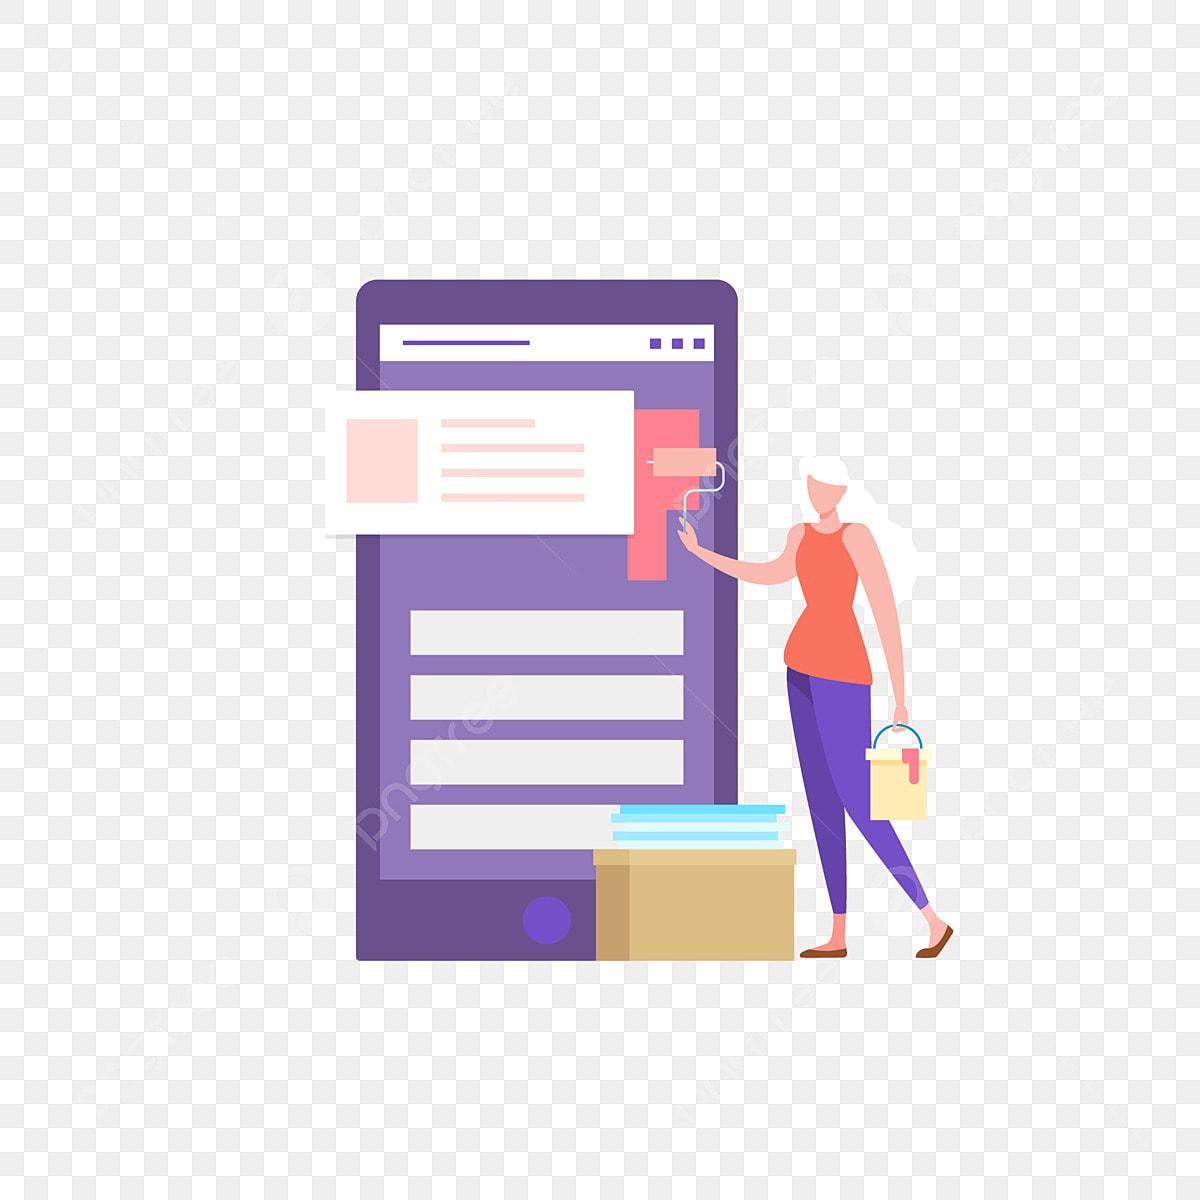 Business Company Software Development Mobile App Development Design